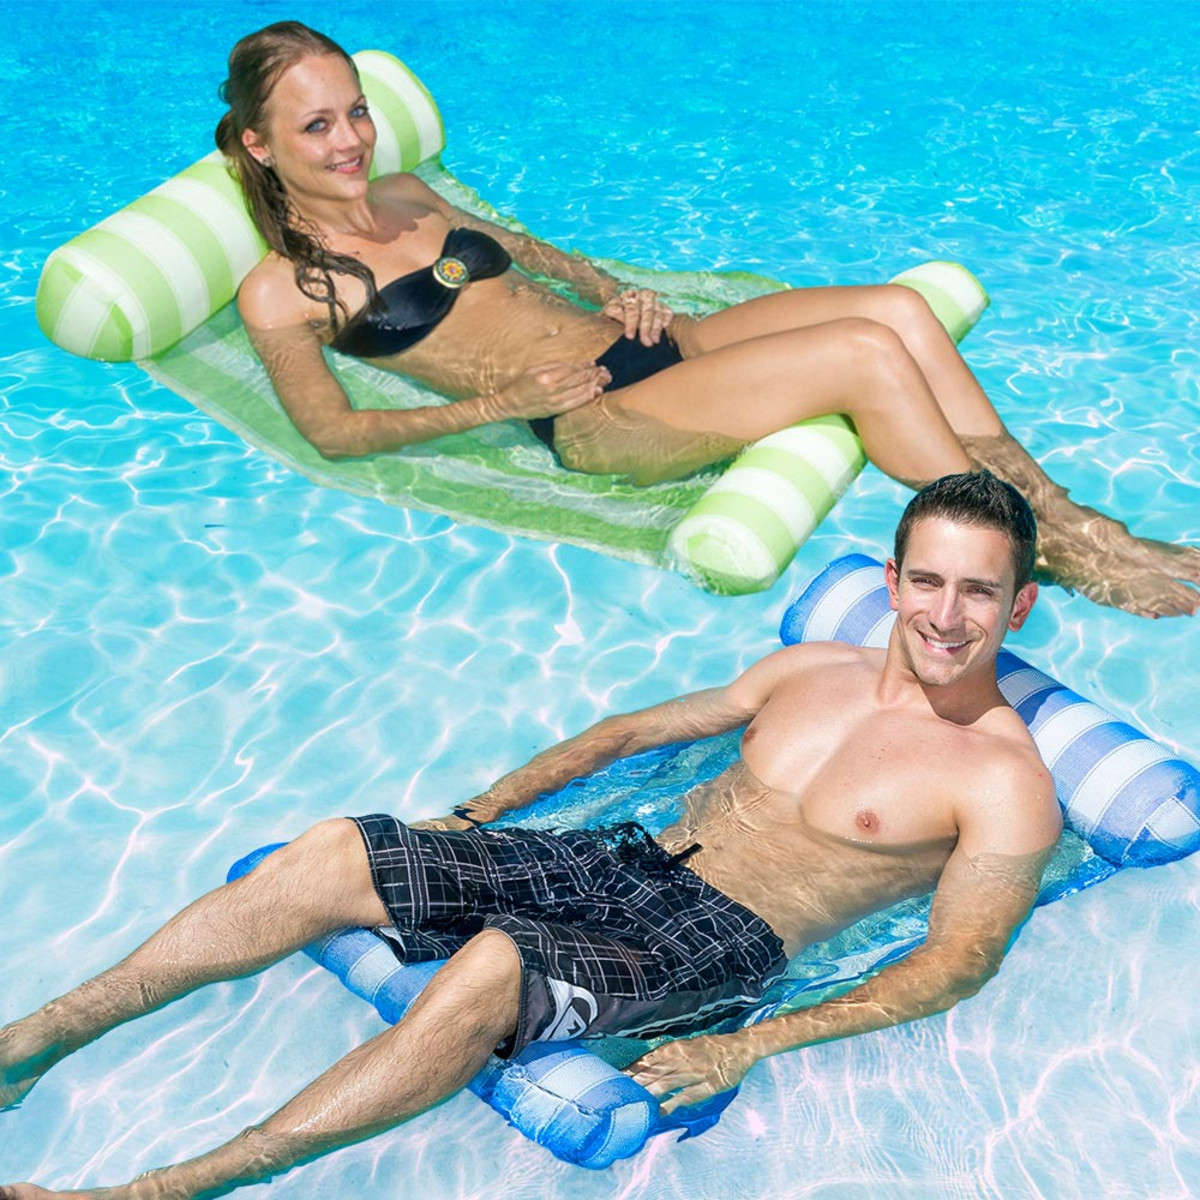 Poolmaster HAMMOCK WATER LOUNGER - amazon.com